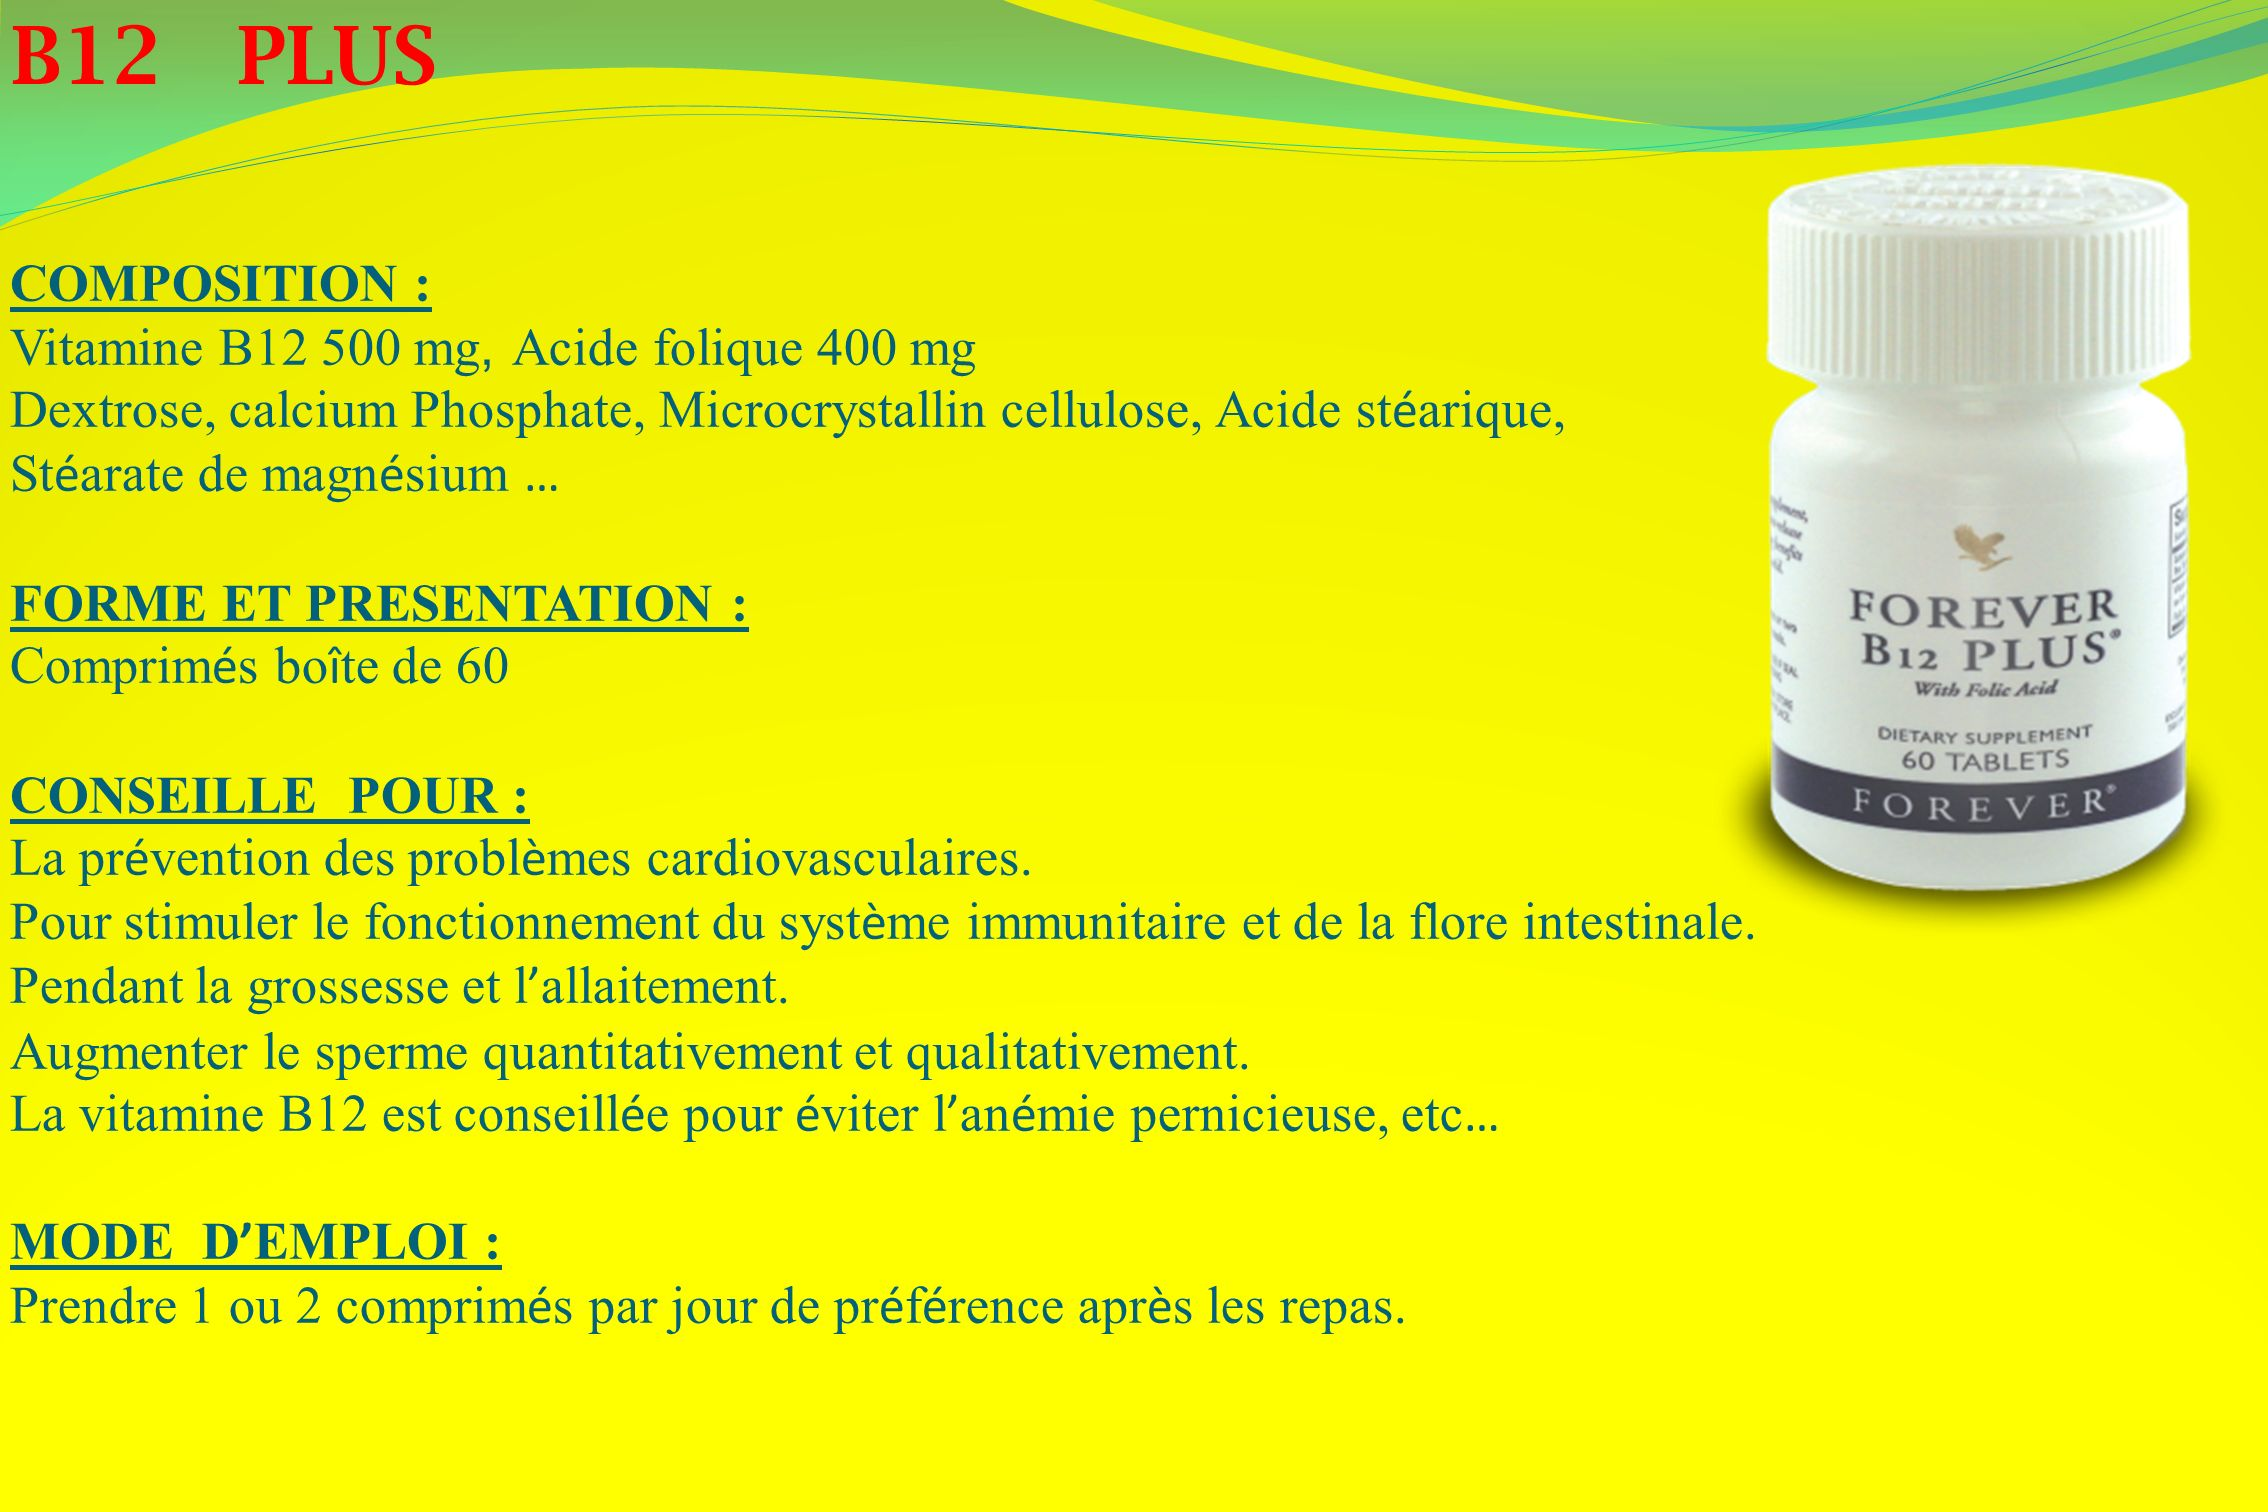 B12 PLUS COMPOSITION : Vitamine B12 500 mg, Acide folique 400 mg Dextrose, calcium Phosphate, Microcrystallin cellulose, Acide st é arique, St é arate